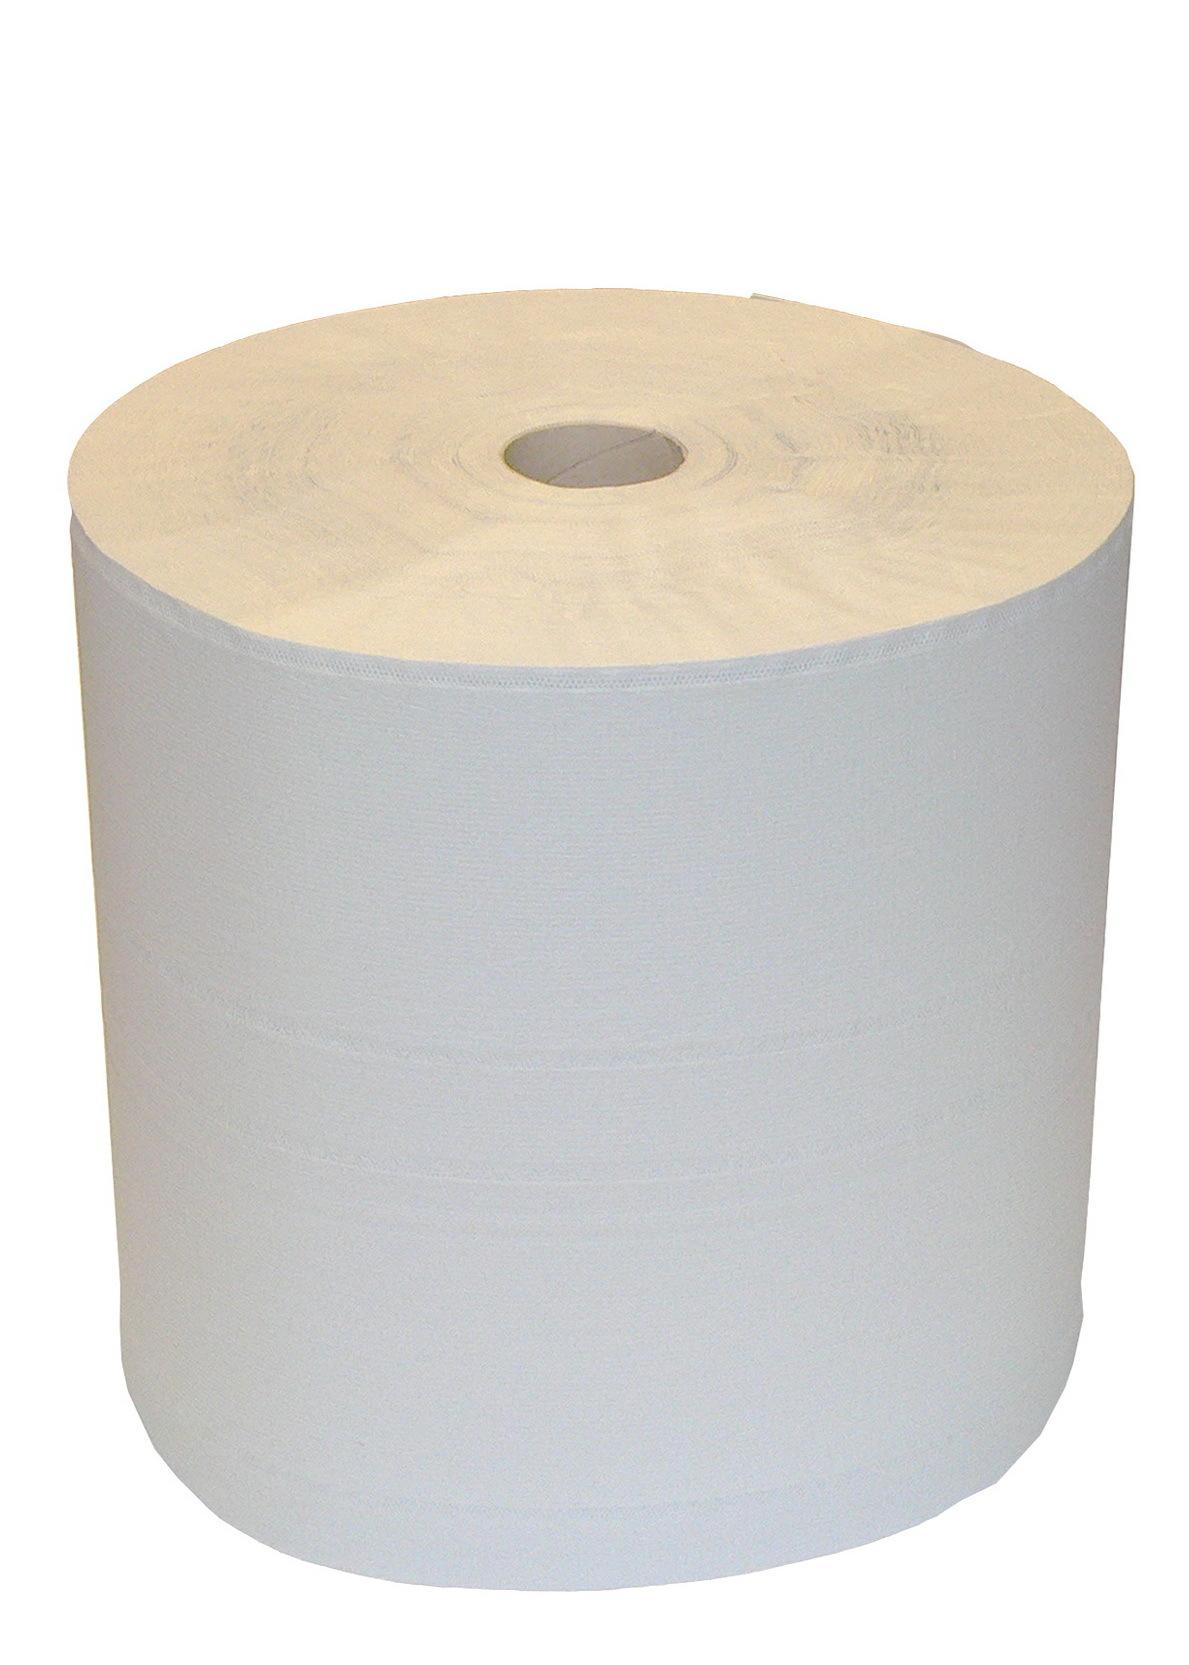 Kimberly Reinigungspapier 2-lagig A190